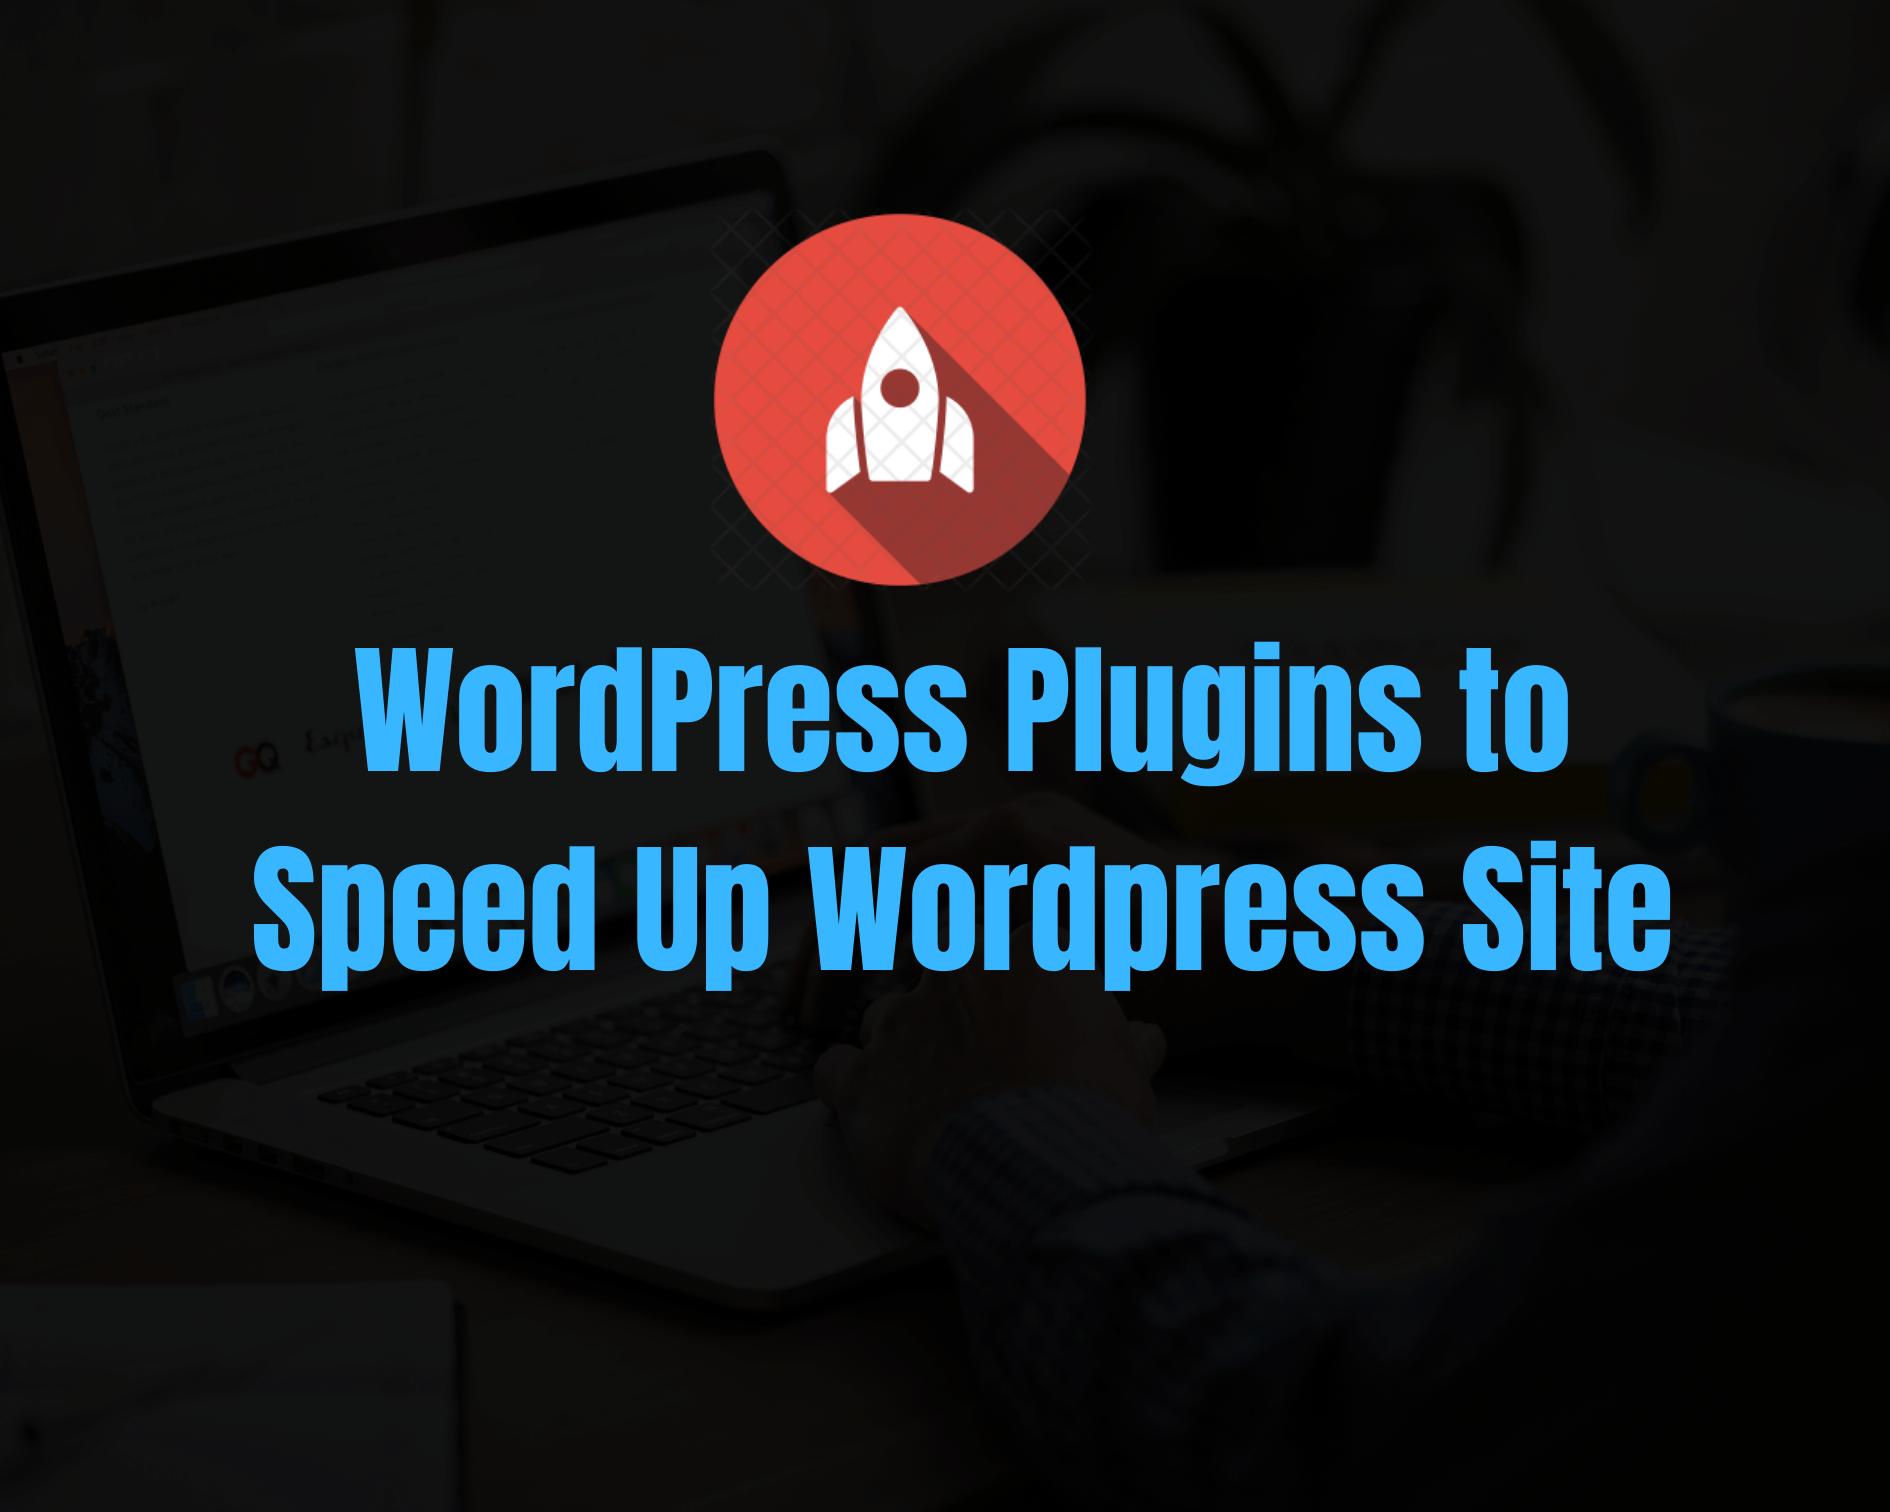 5 Best Plugins to Speed Up WordPress Site